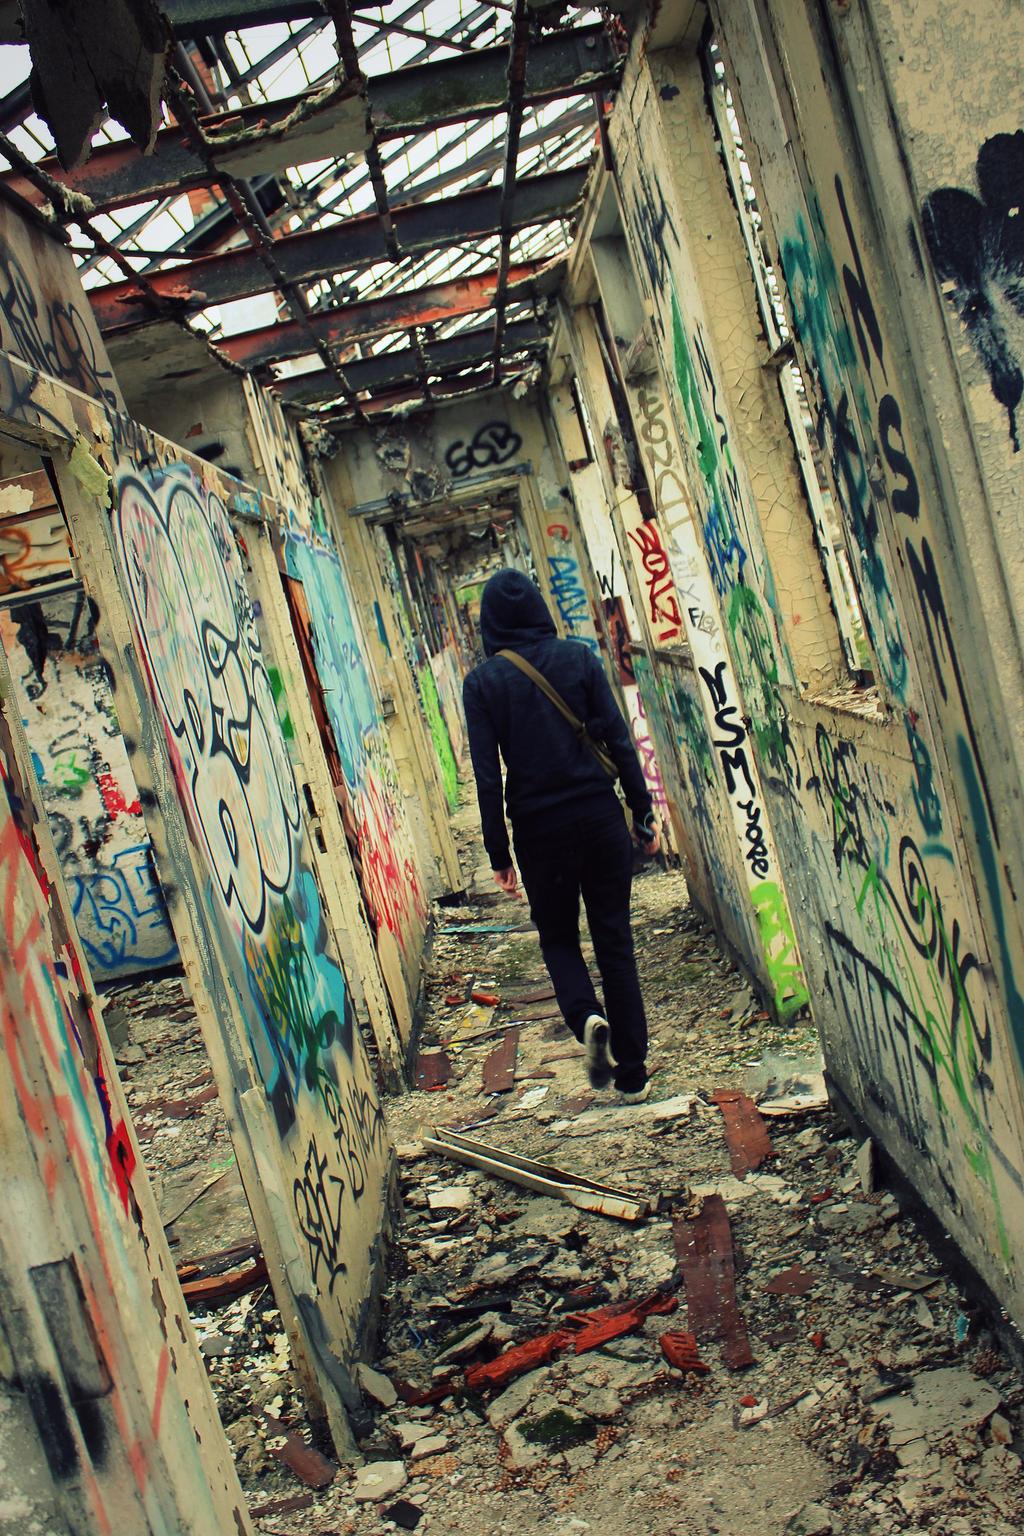 Hallway of undergroud art by AuroraxCore